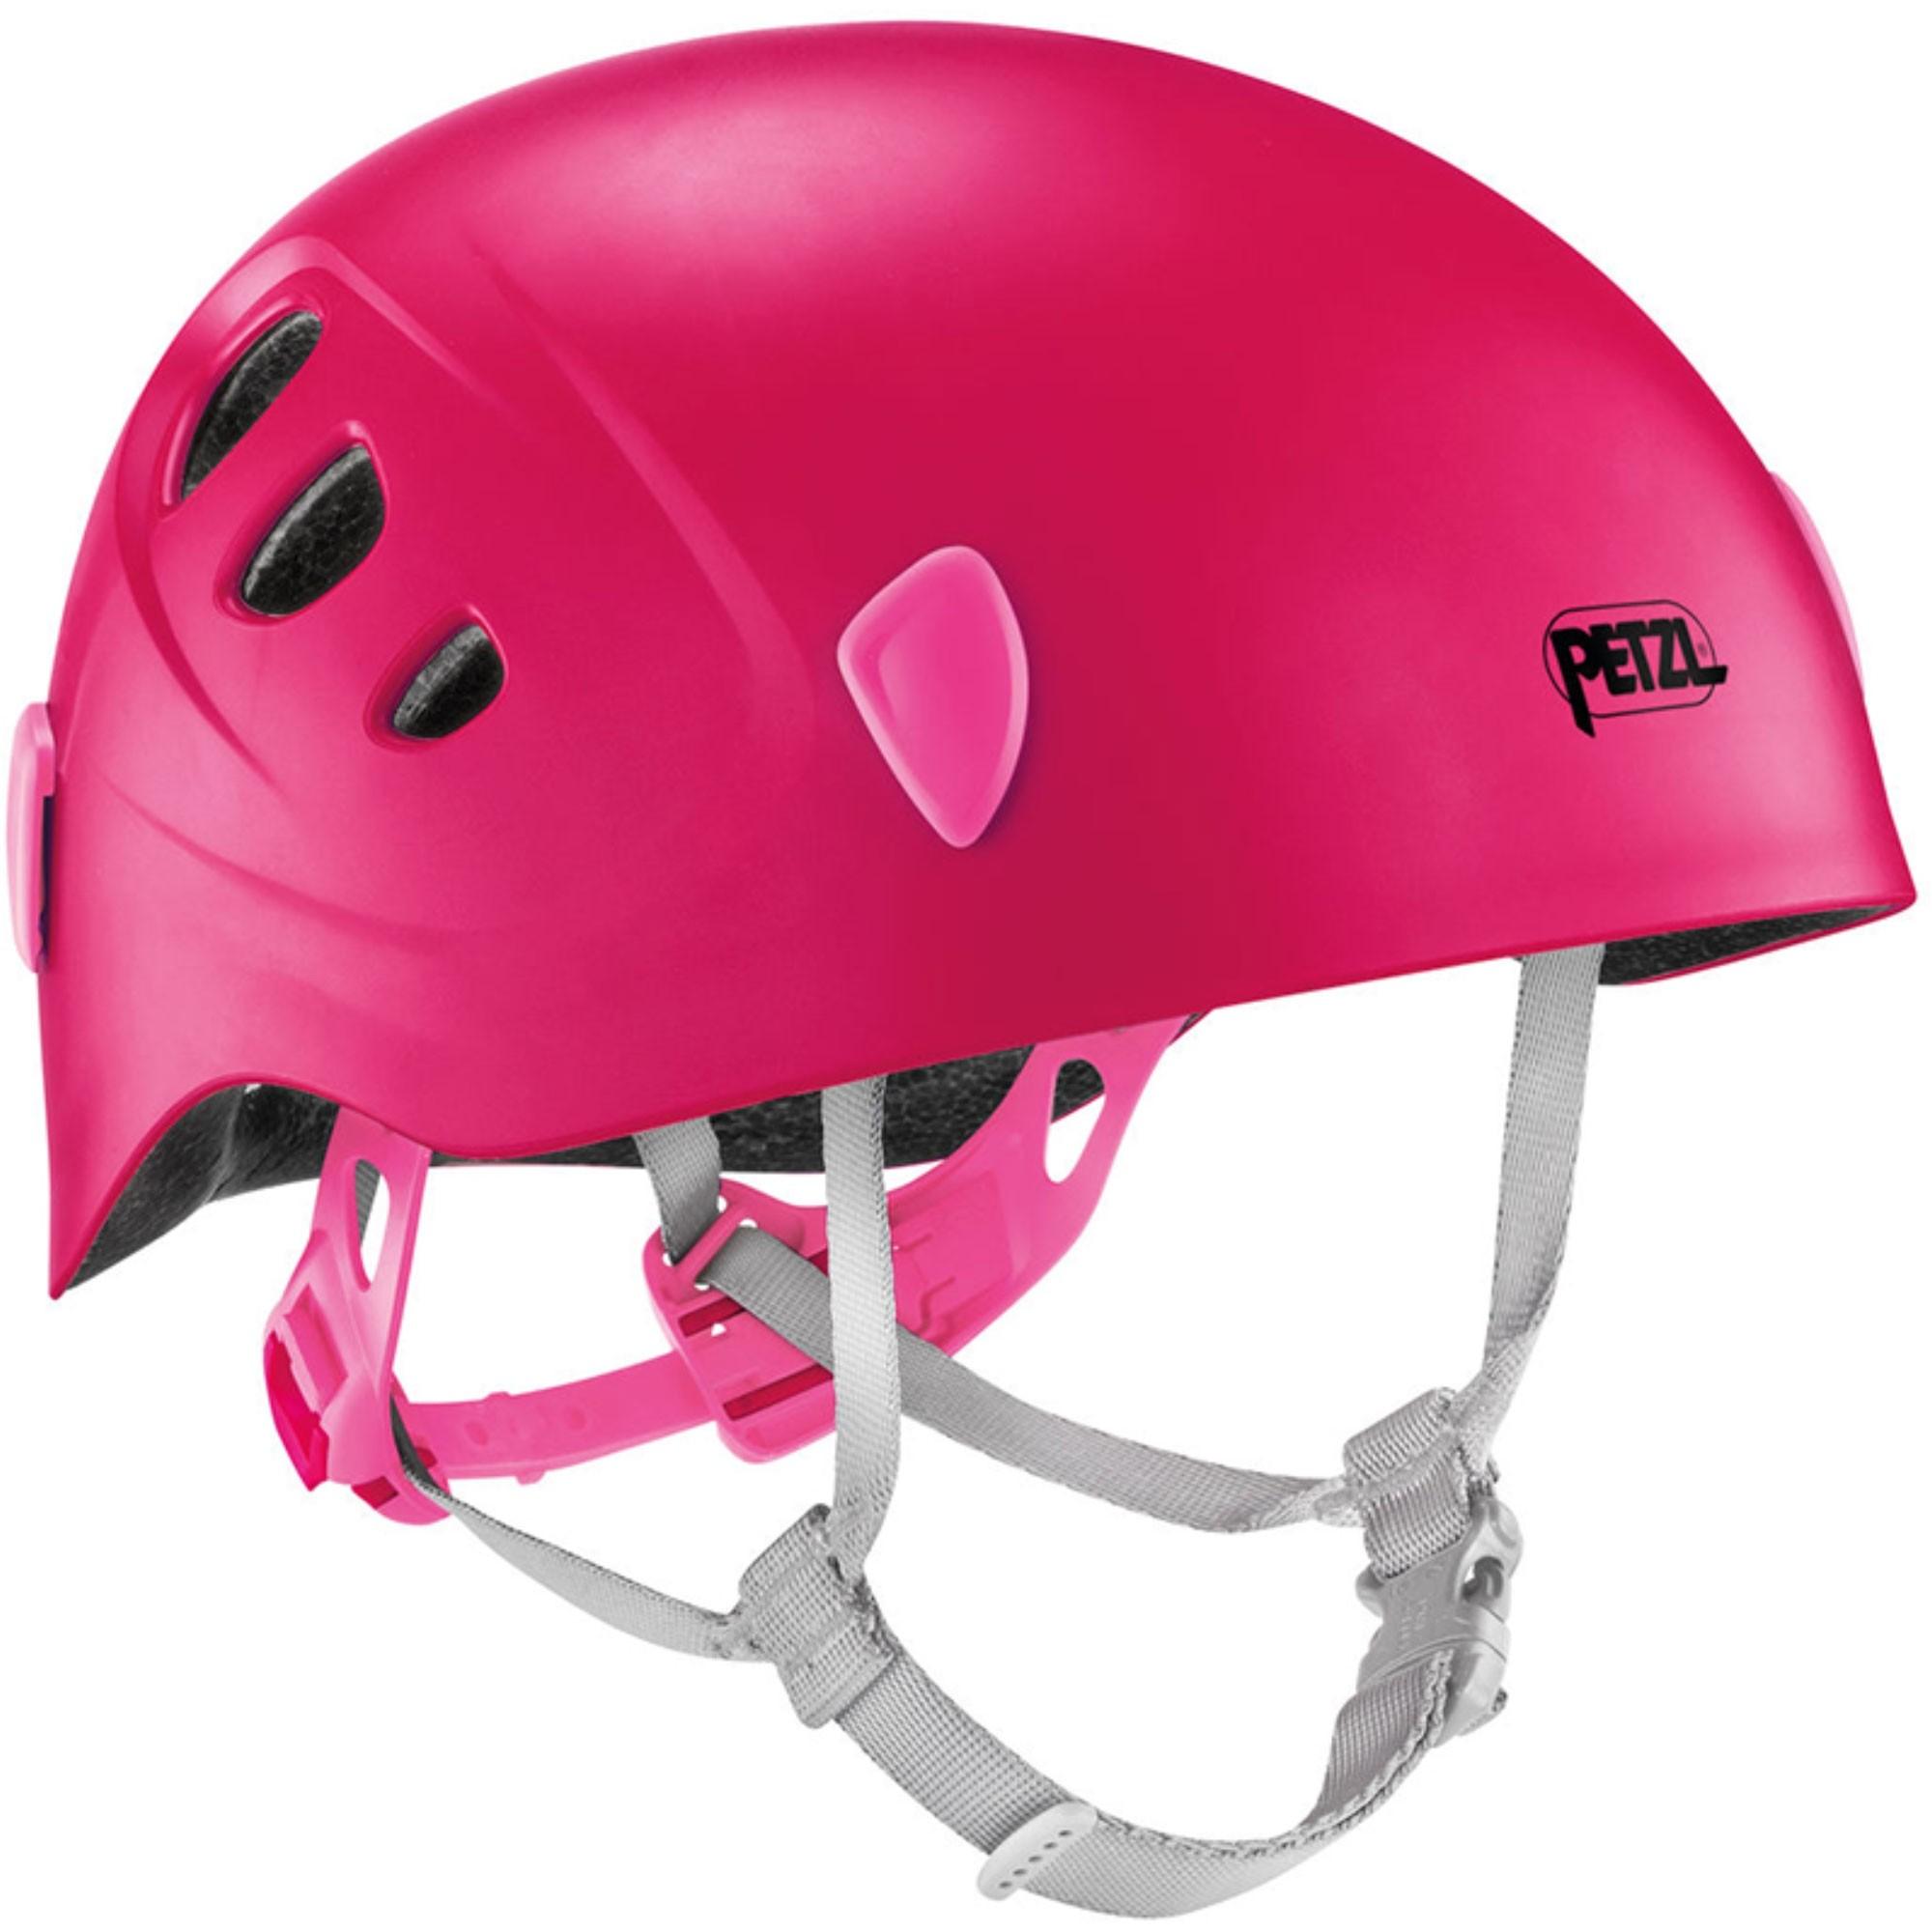 PETZL - Picchu Children's Multi-Sport Helmet - Raspberry